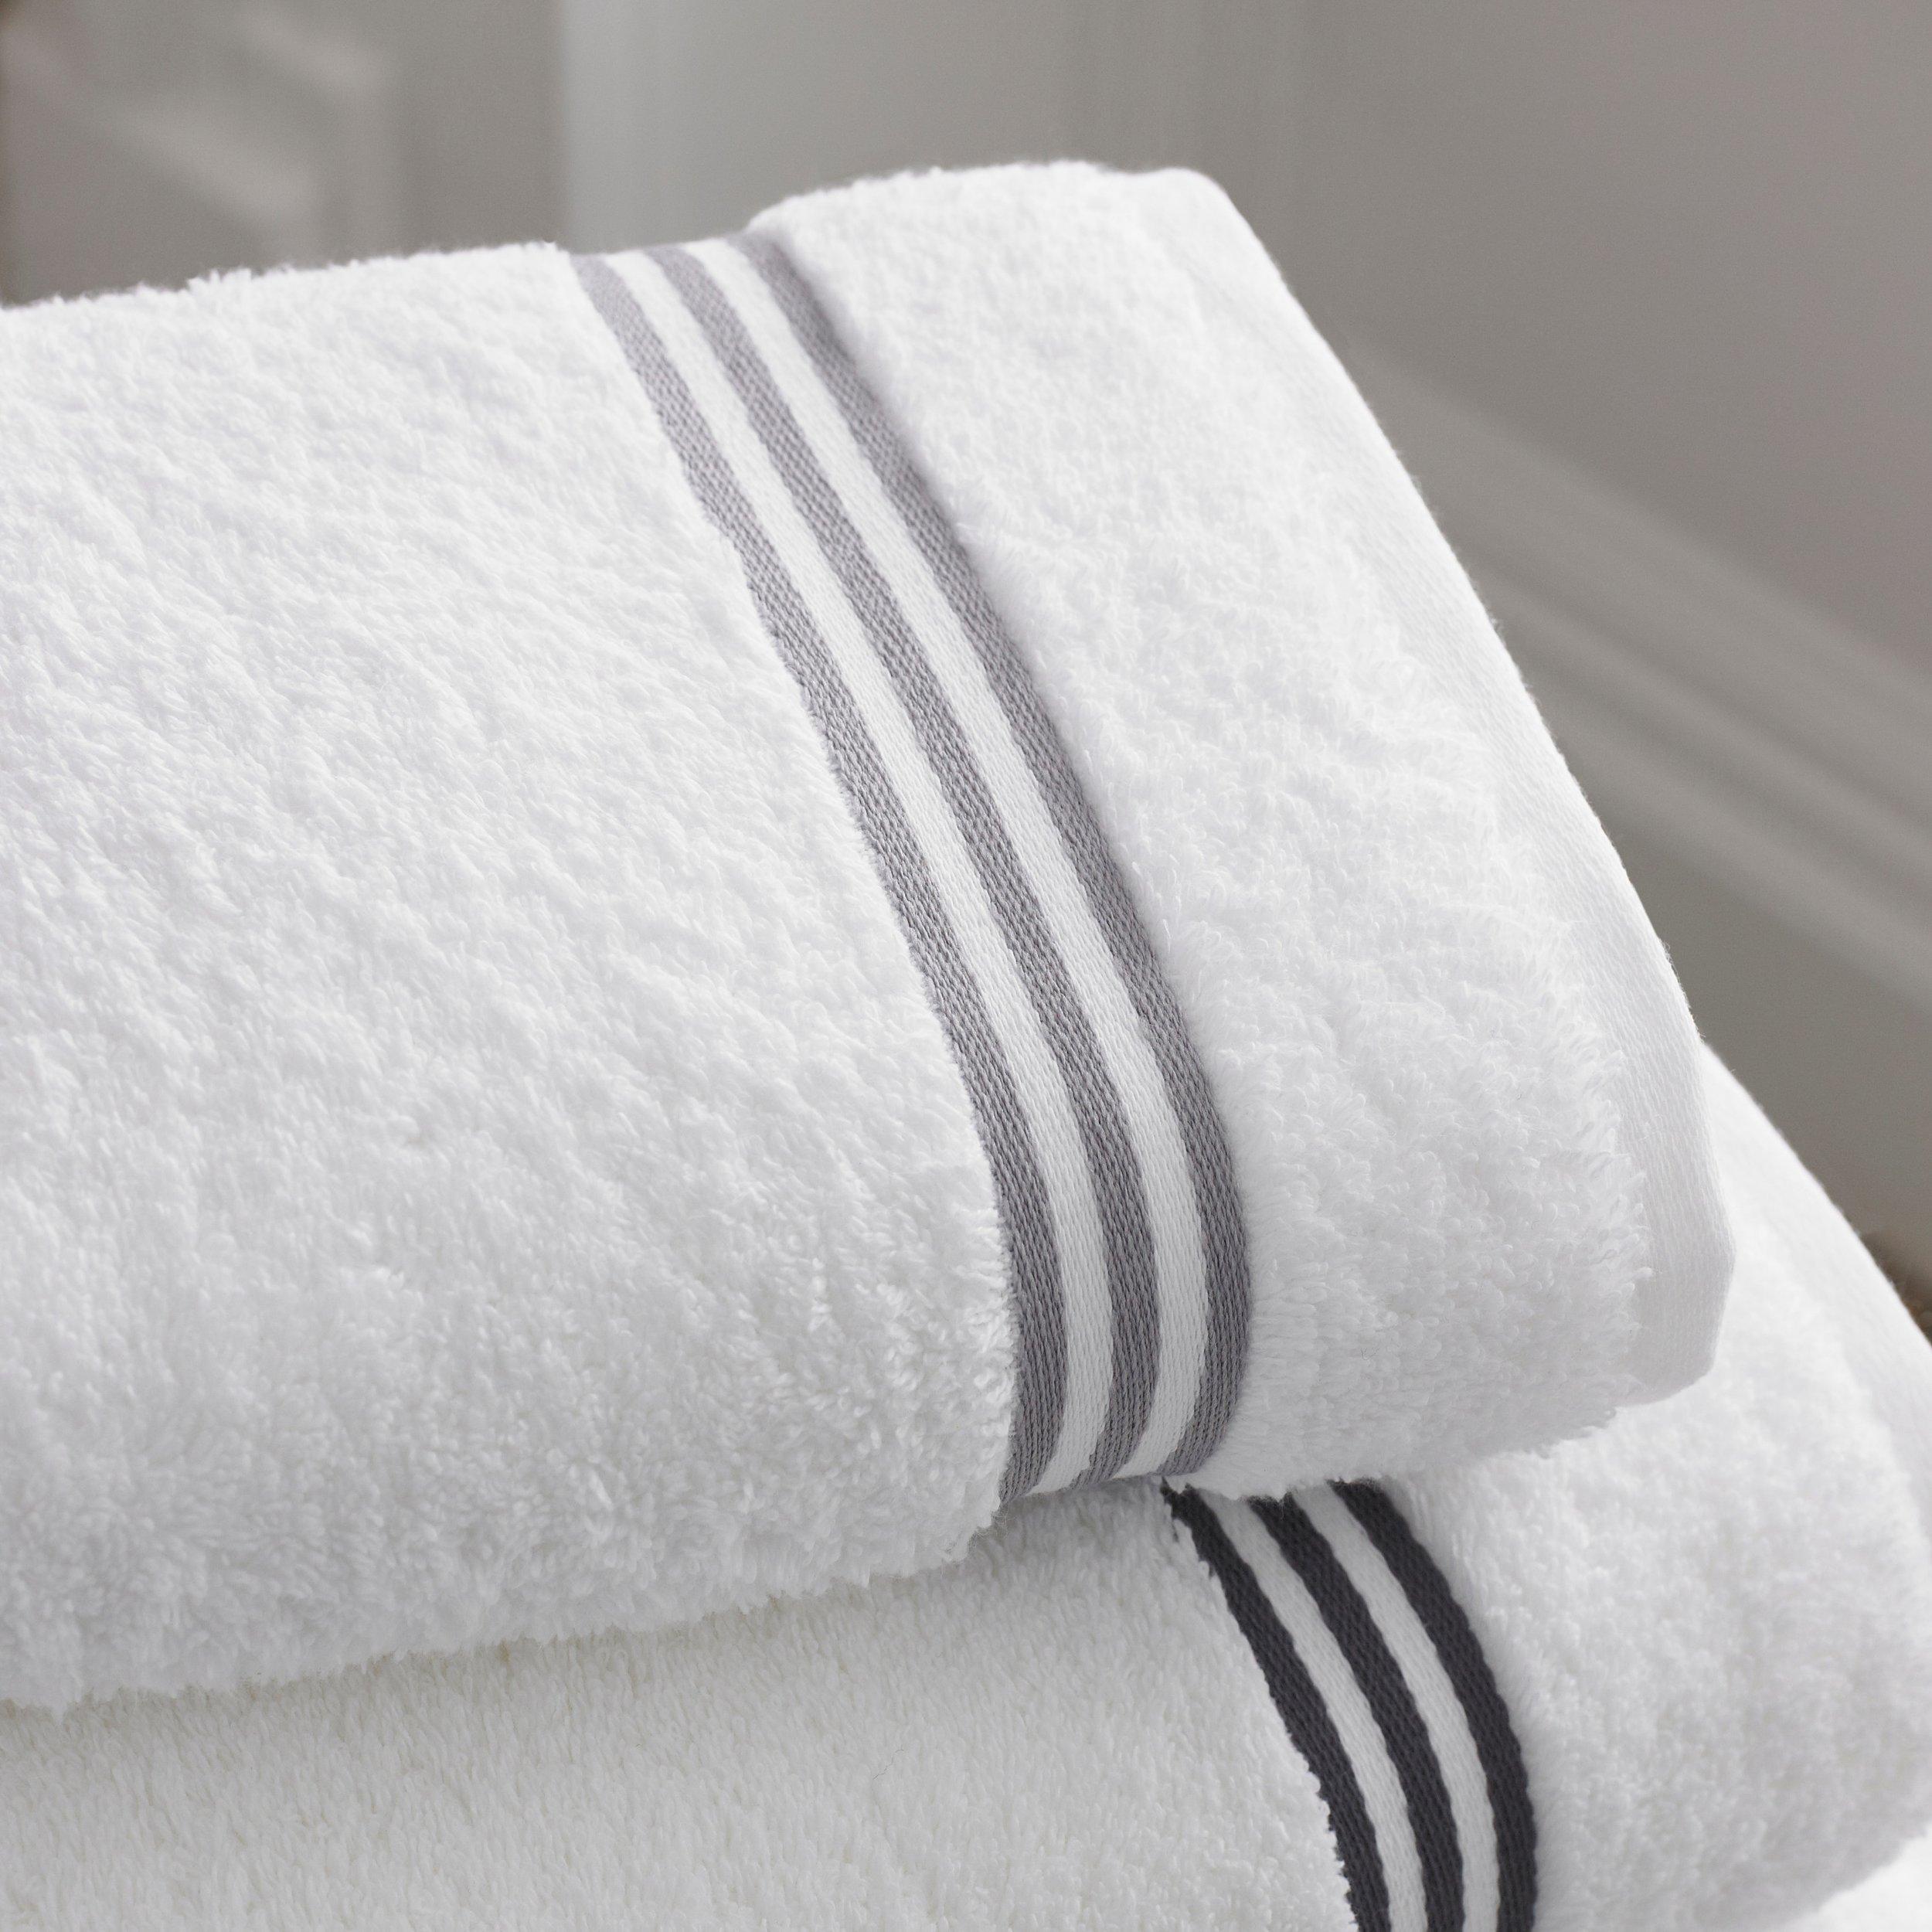 bath-bathroom-towels-12679.jpg